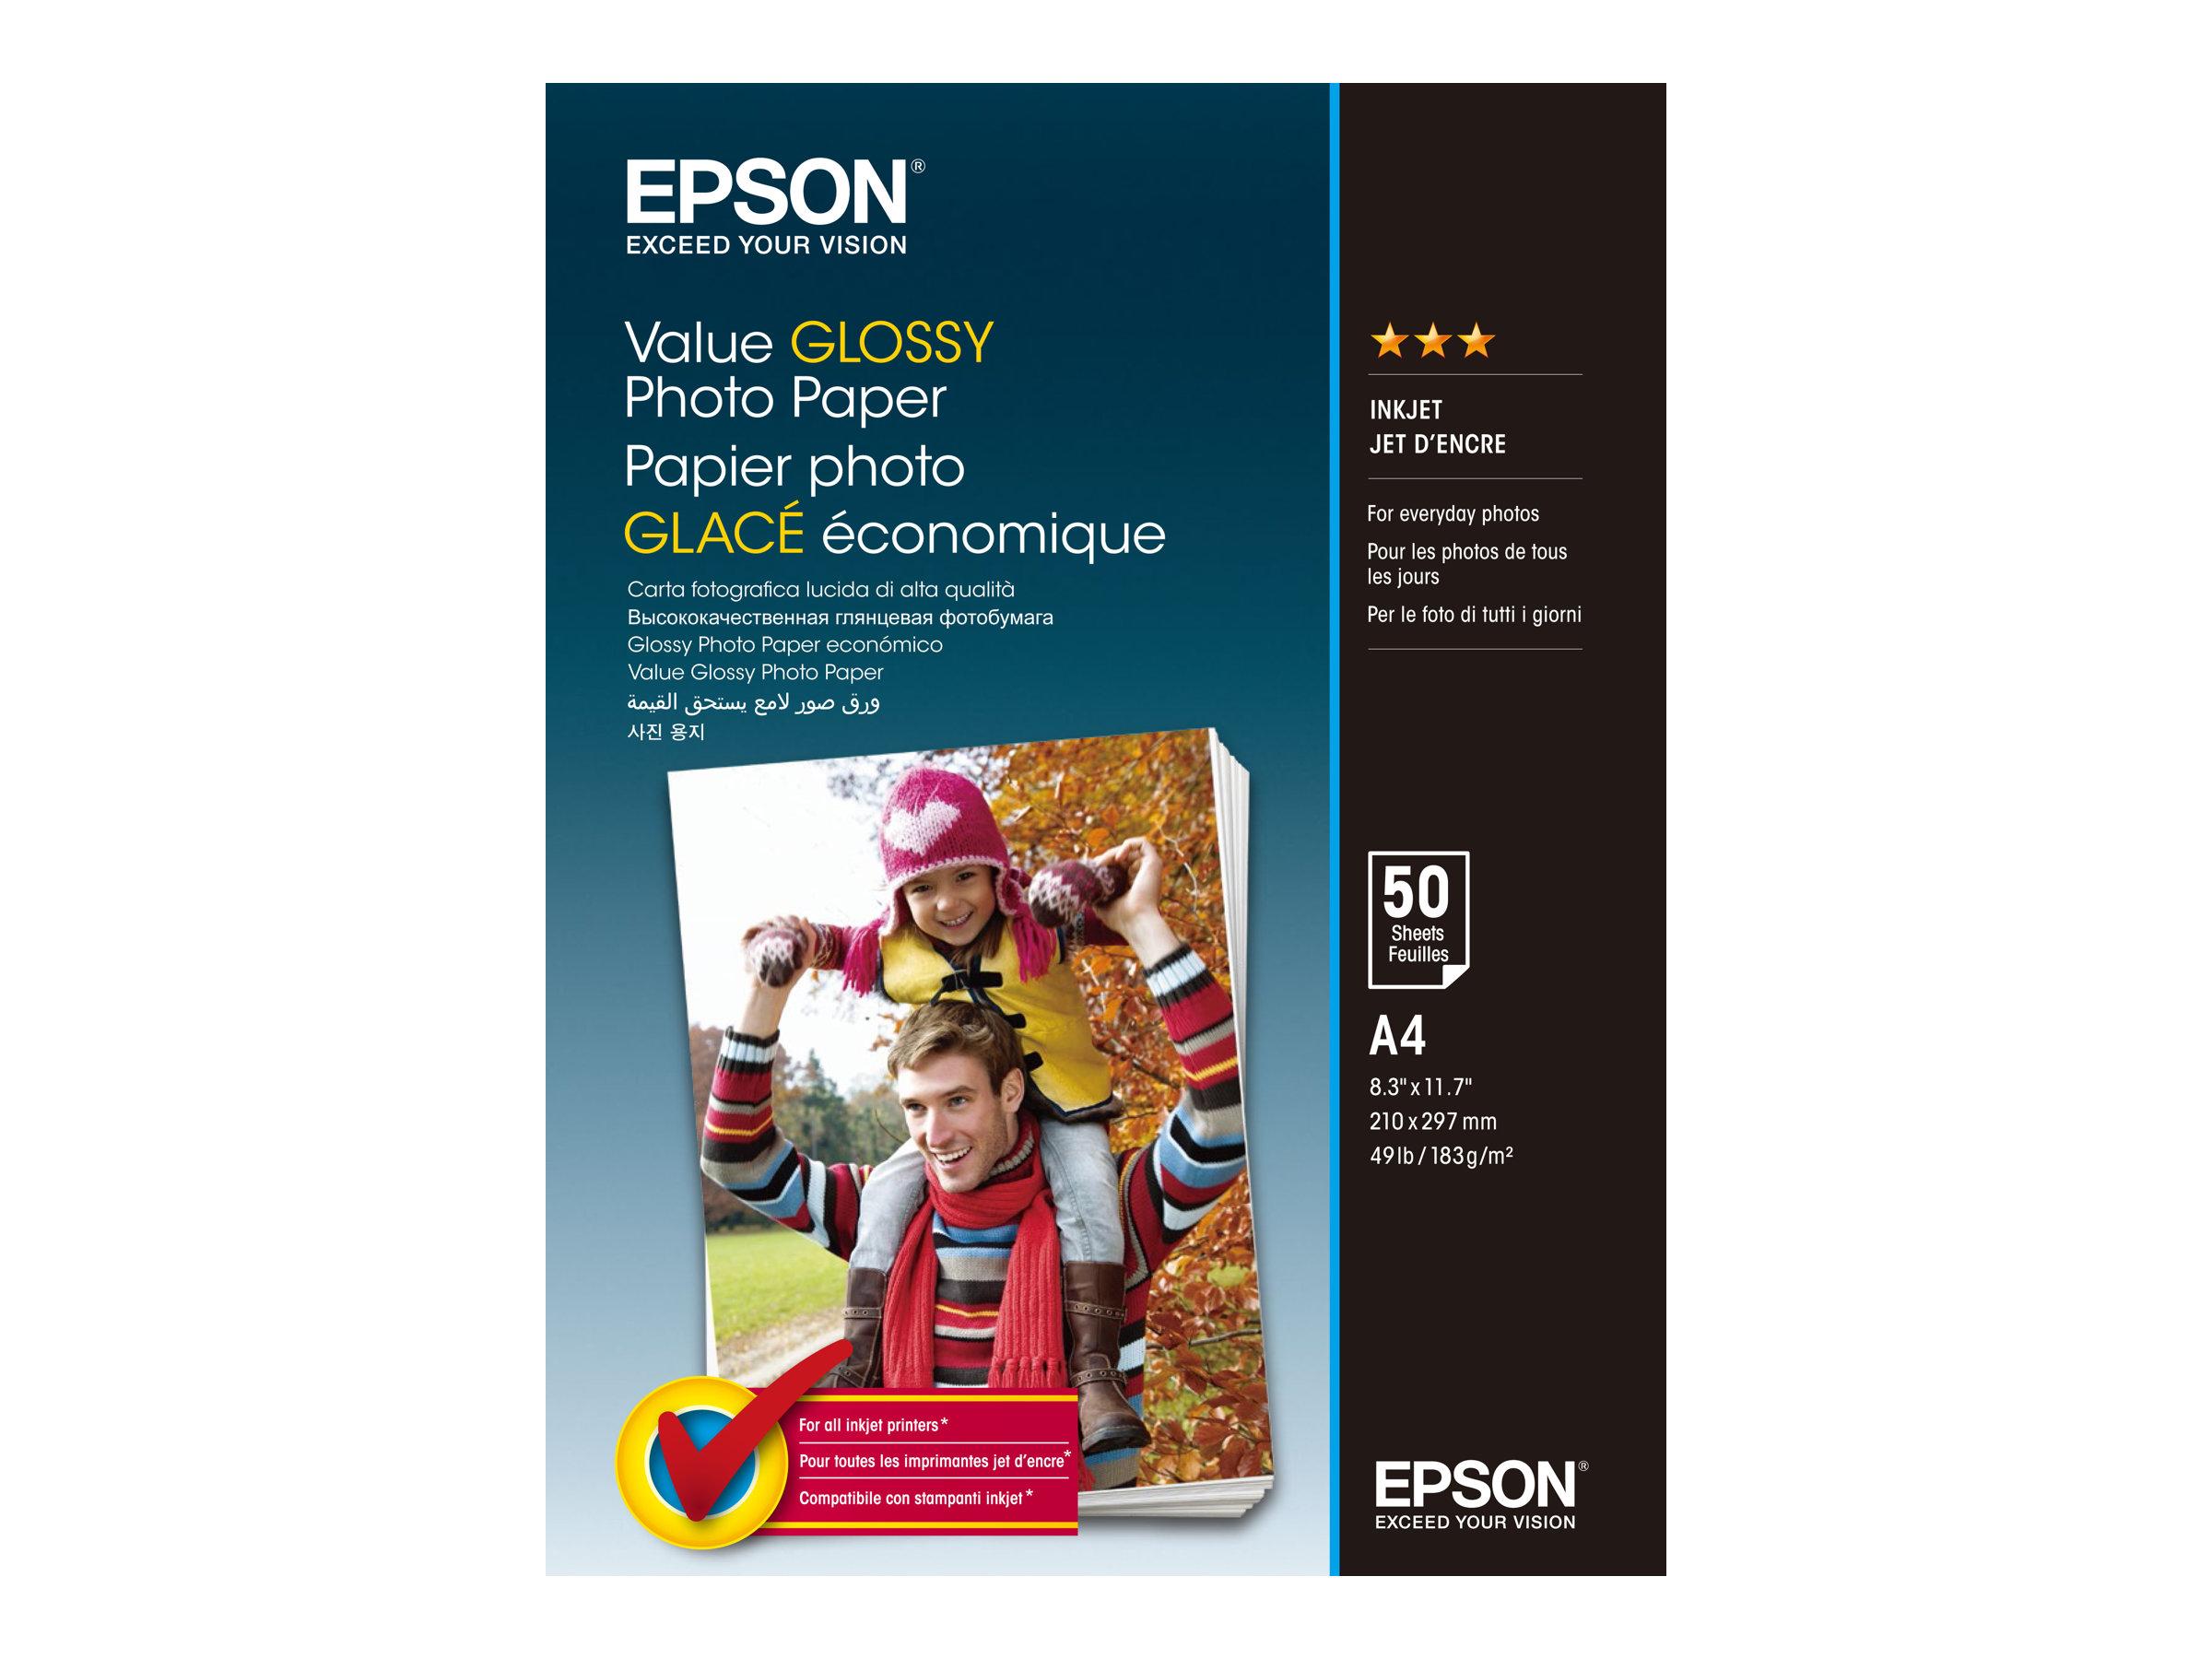 Epson Value - Glänzend - A4 (210 x 297 mm) - 183 g/m²